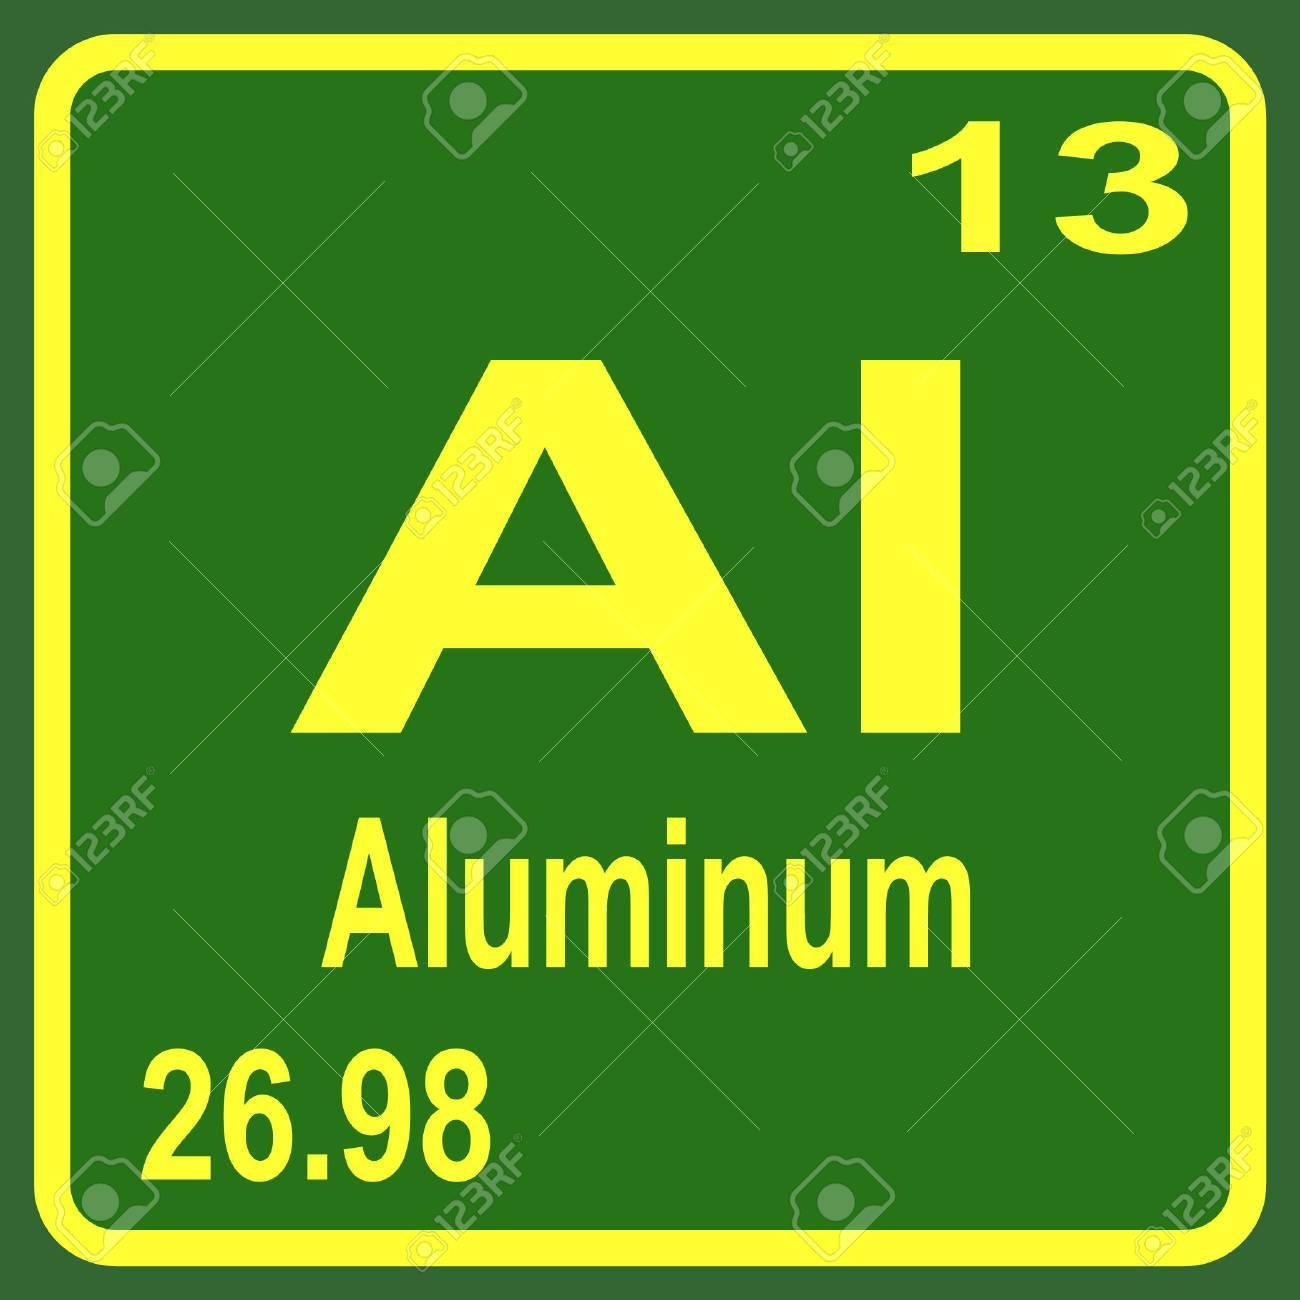 periodic table of elements aluminum stock vector 53901619 - Periodic Table Aluminum